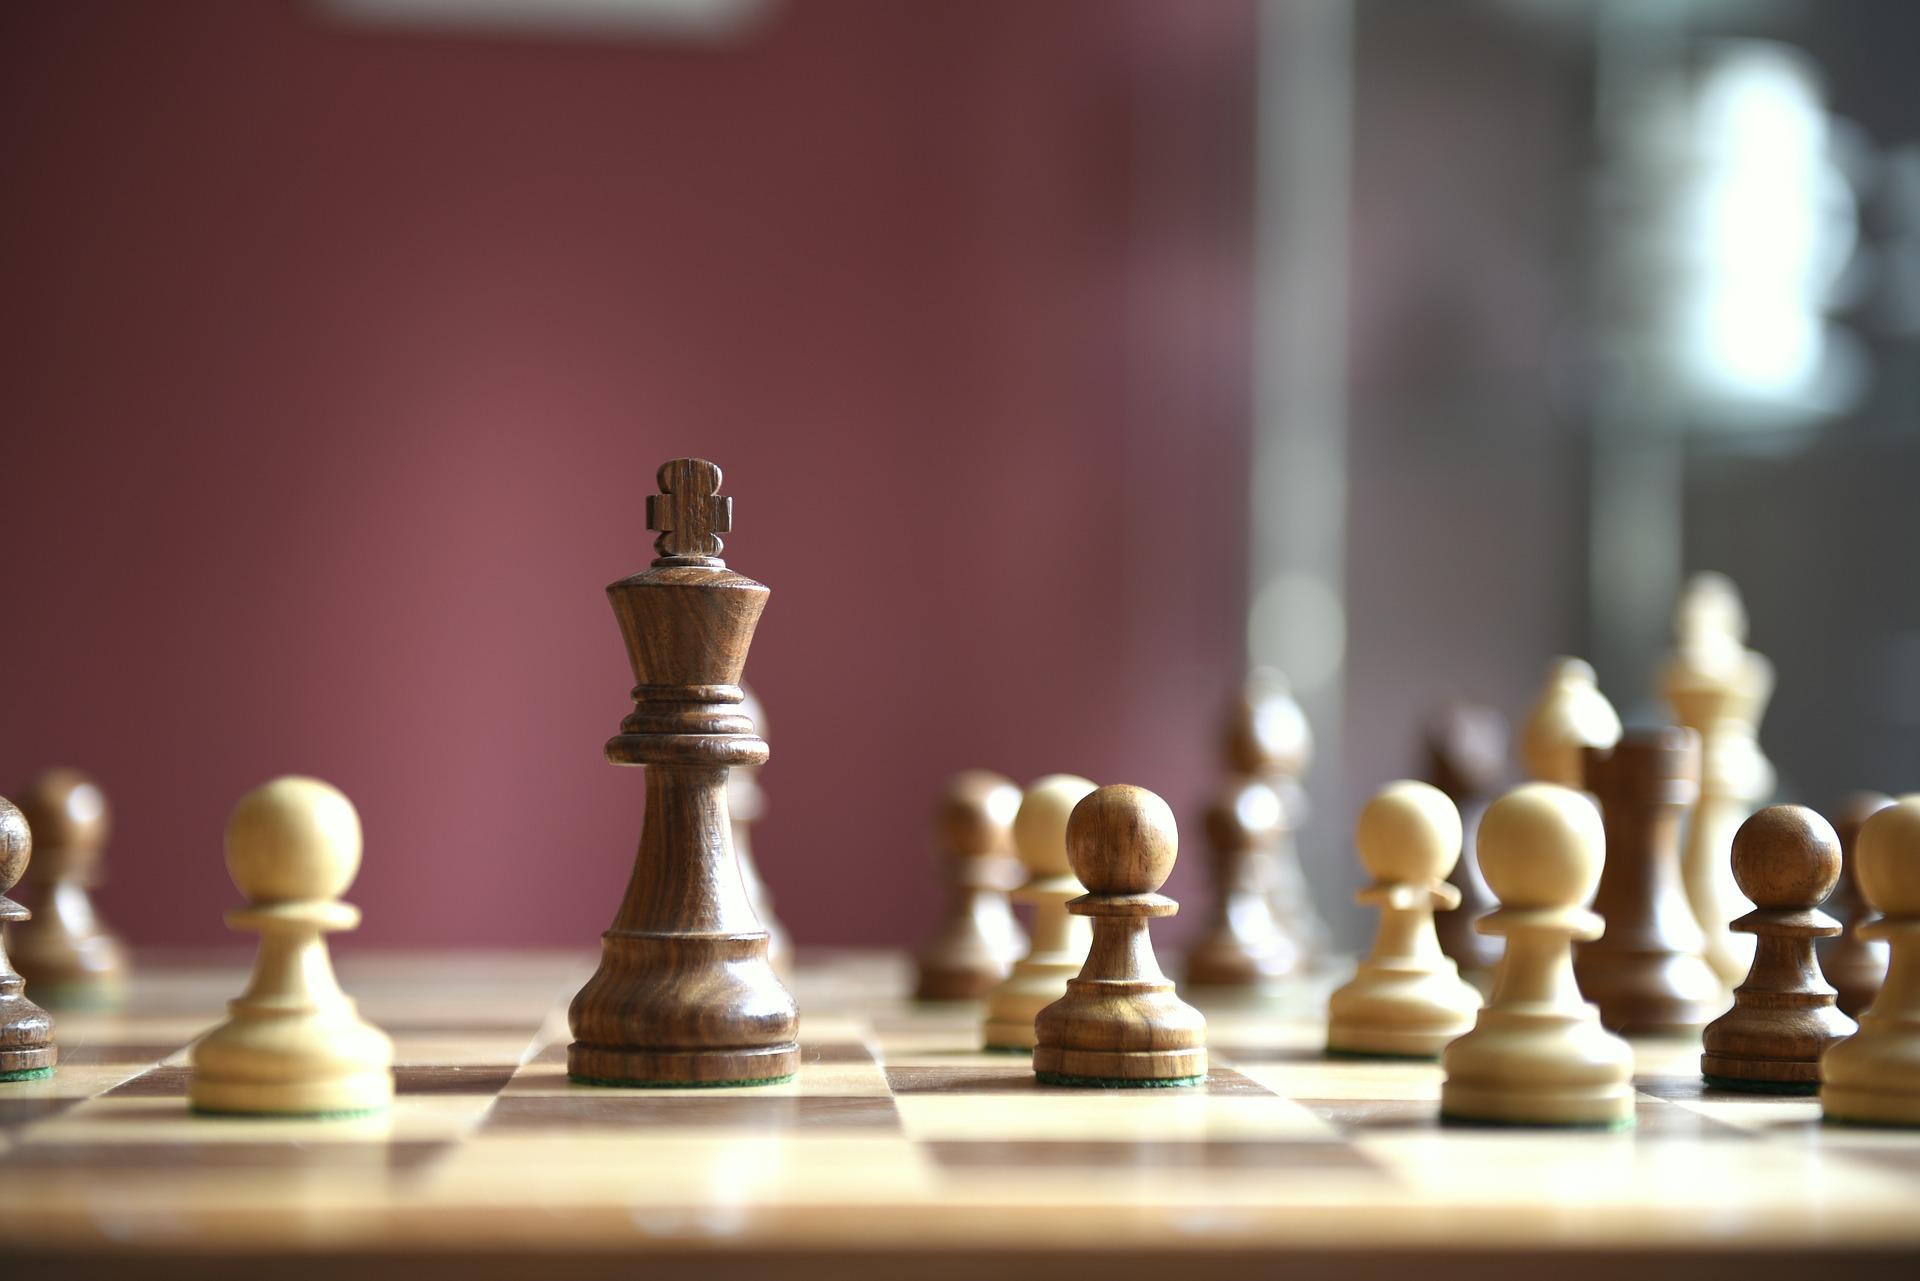 trivia crack online unblocked chess